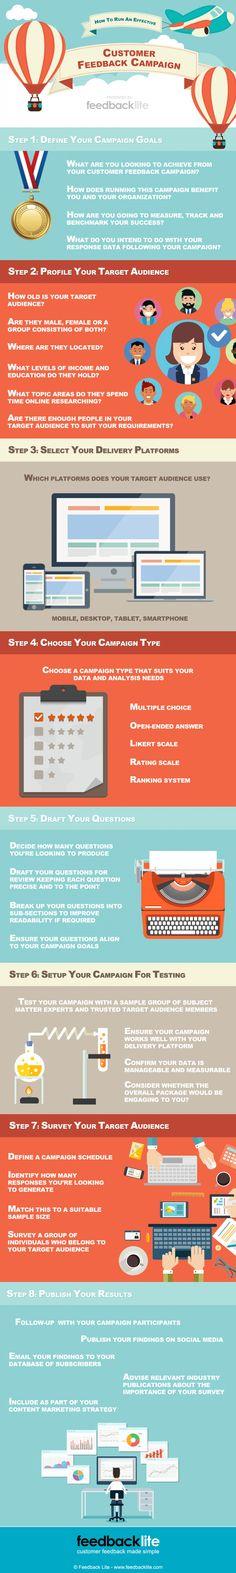 Feedbacks Costumes - feedback survey template